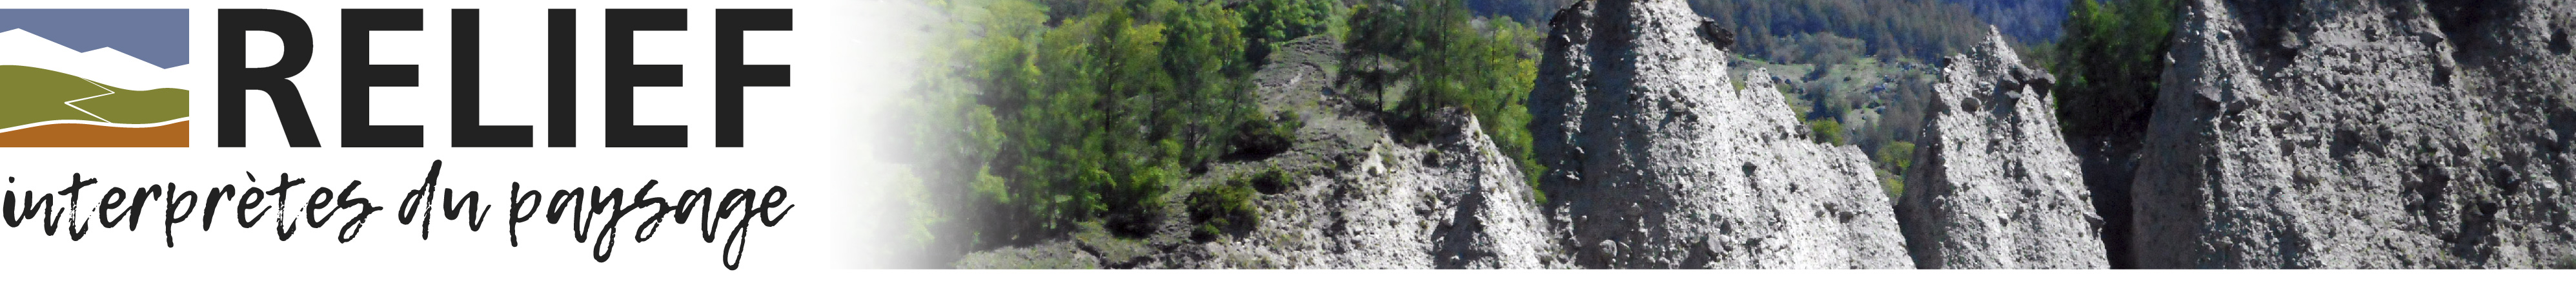 Bureau d'étude Relief | Aigle, Chevenez, Piandera